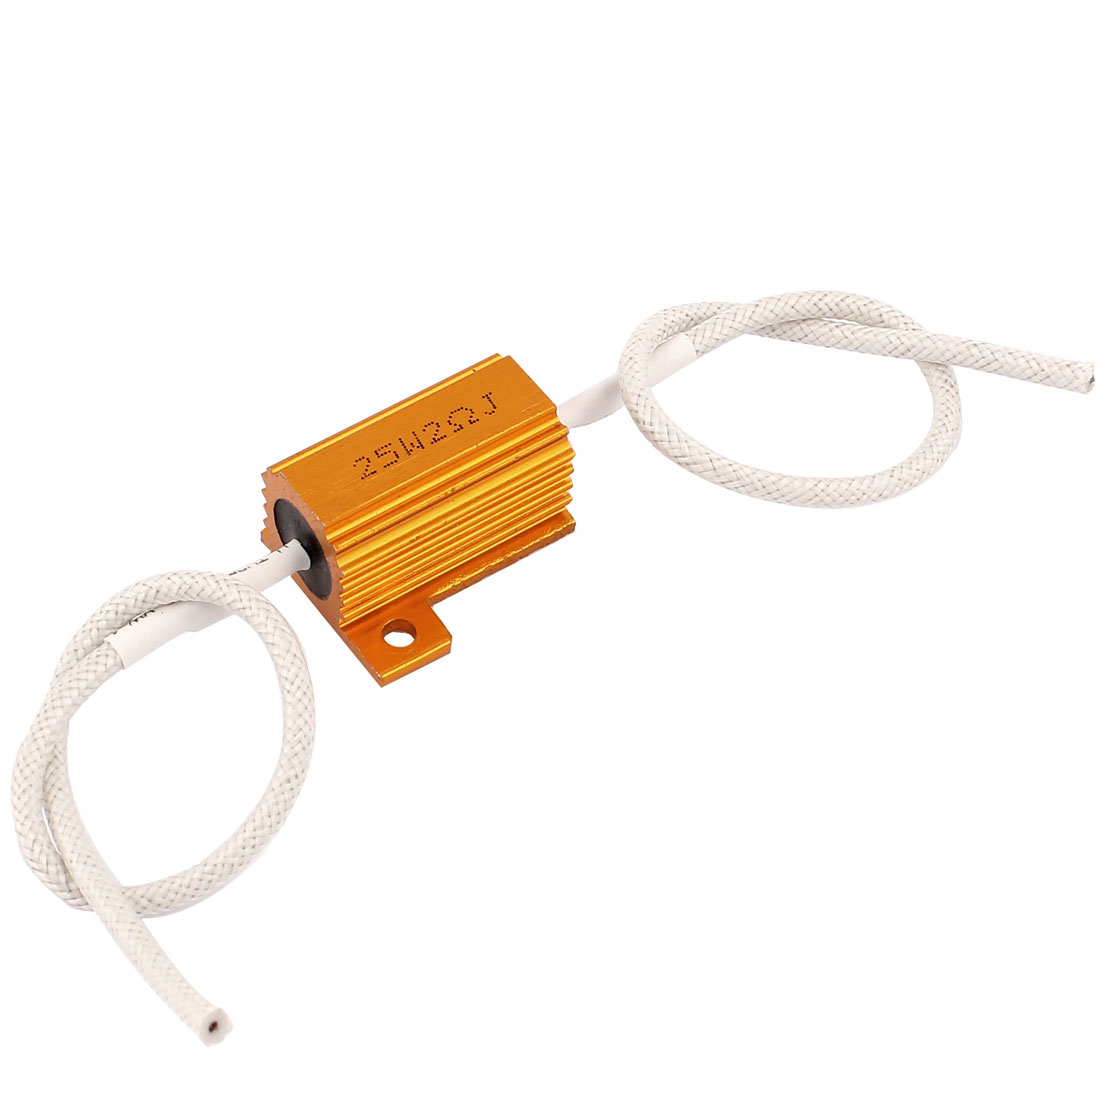 2Ohm 25W 5% Wirewound Car Loudspeaker Aluminum Clad Resistor